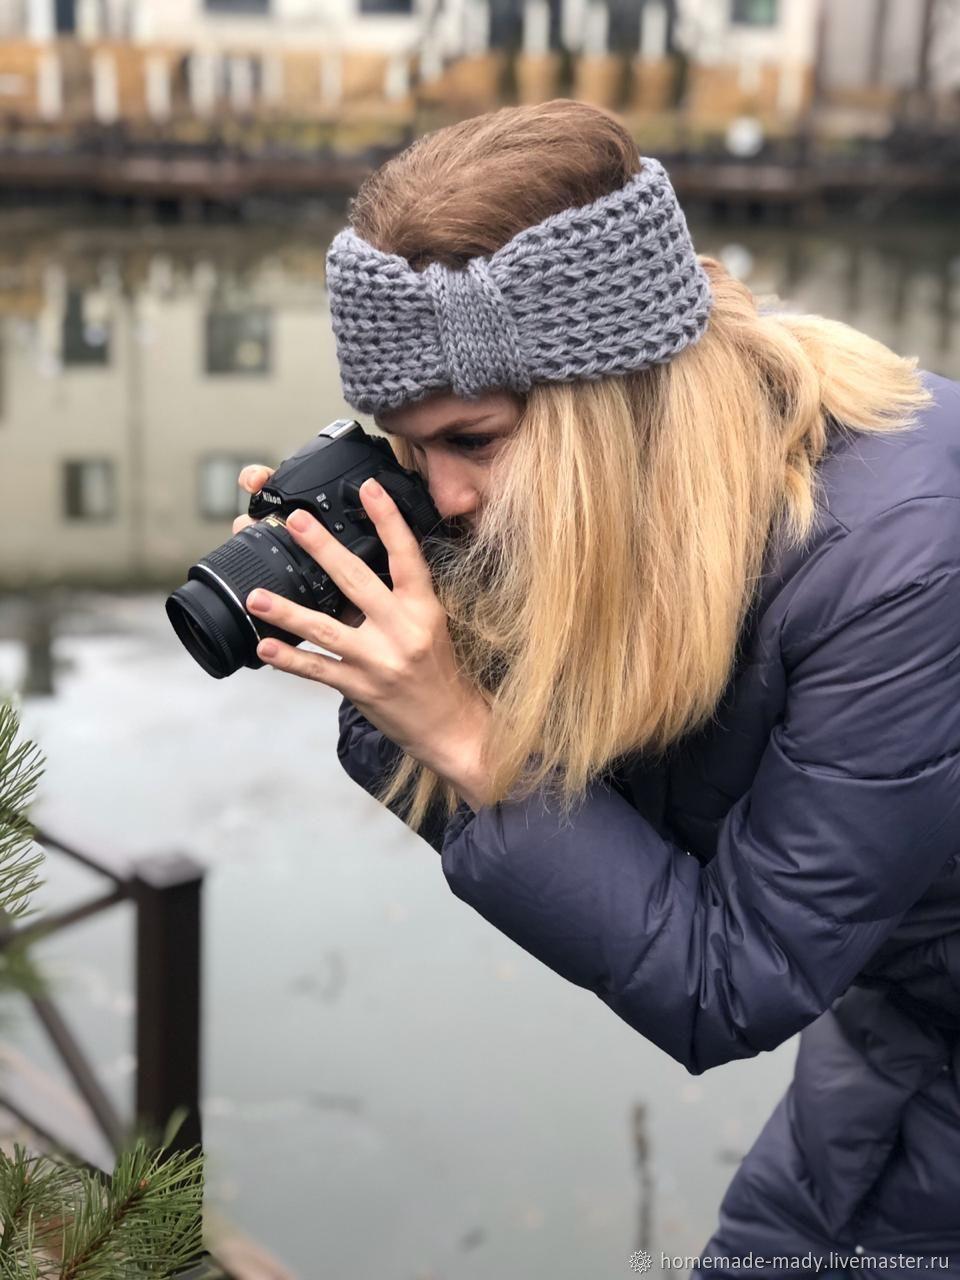 Повязка на голову ТУМАН 100%-шерсть, Повязки, Москва,  Фото №1